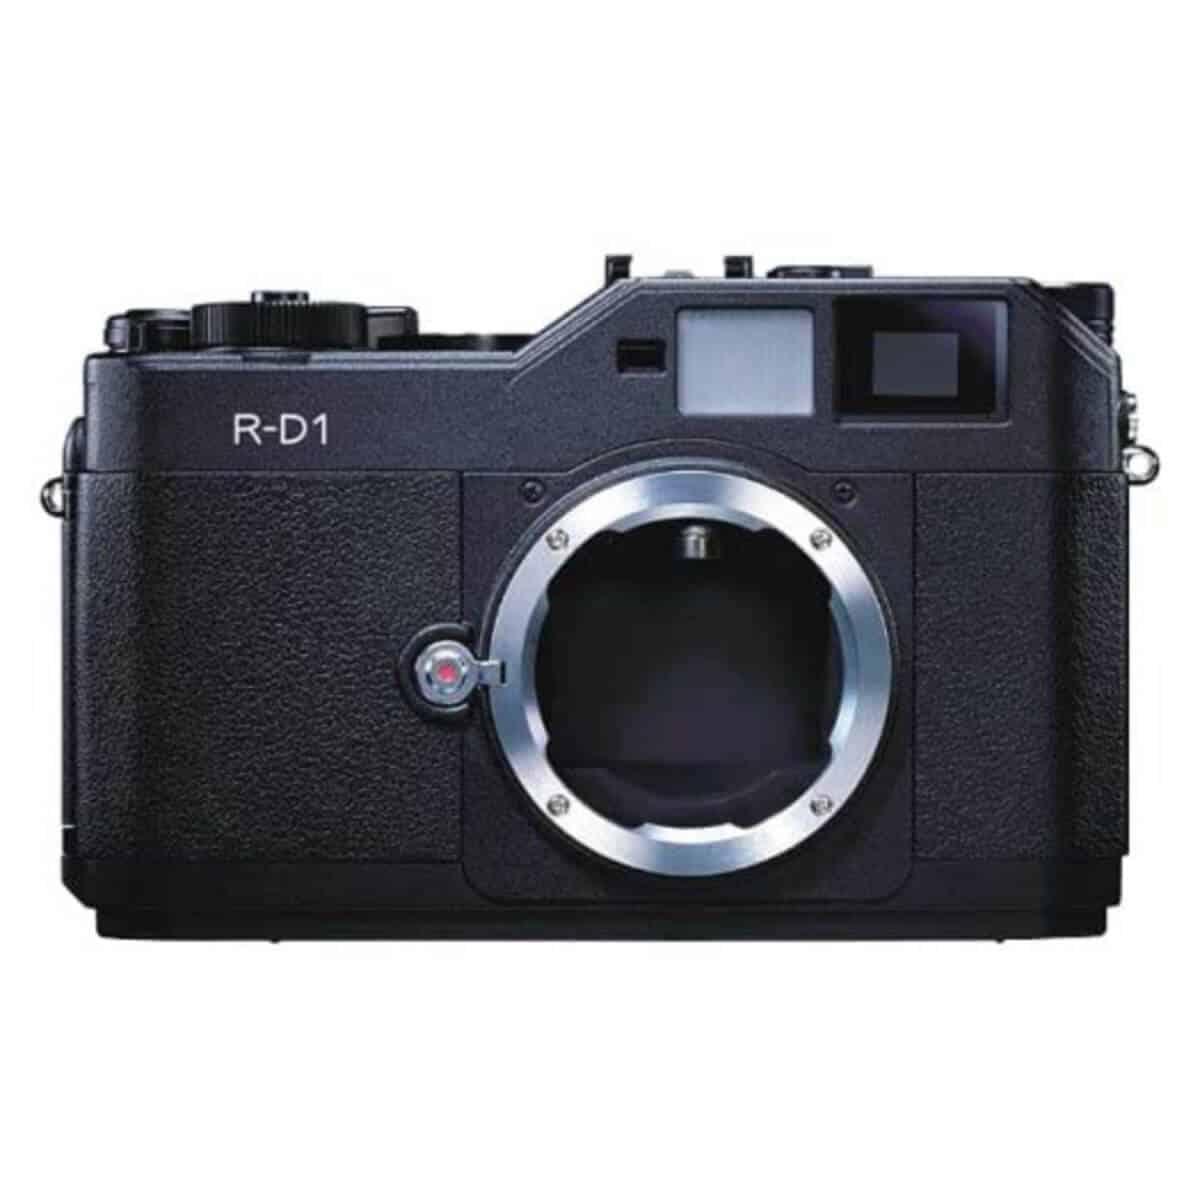 Epson R-D1 digital rangefinder camera.